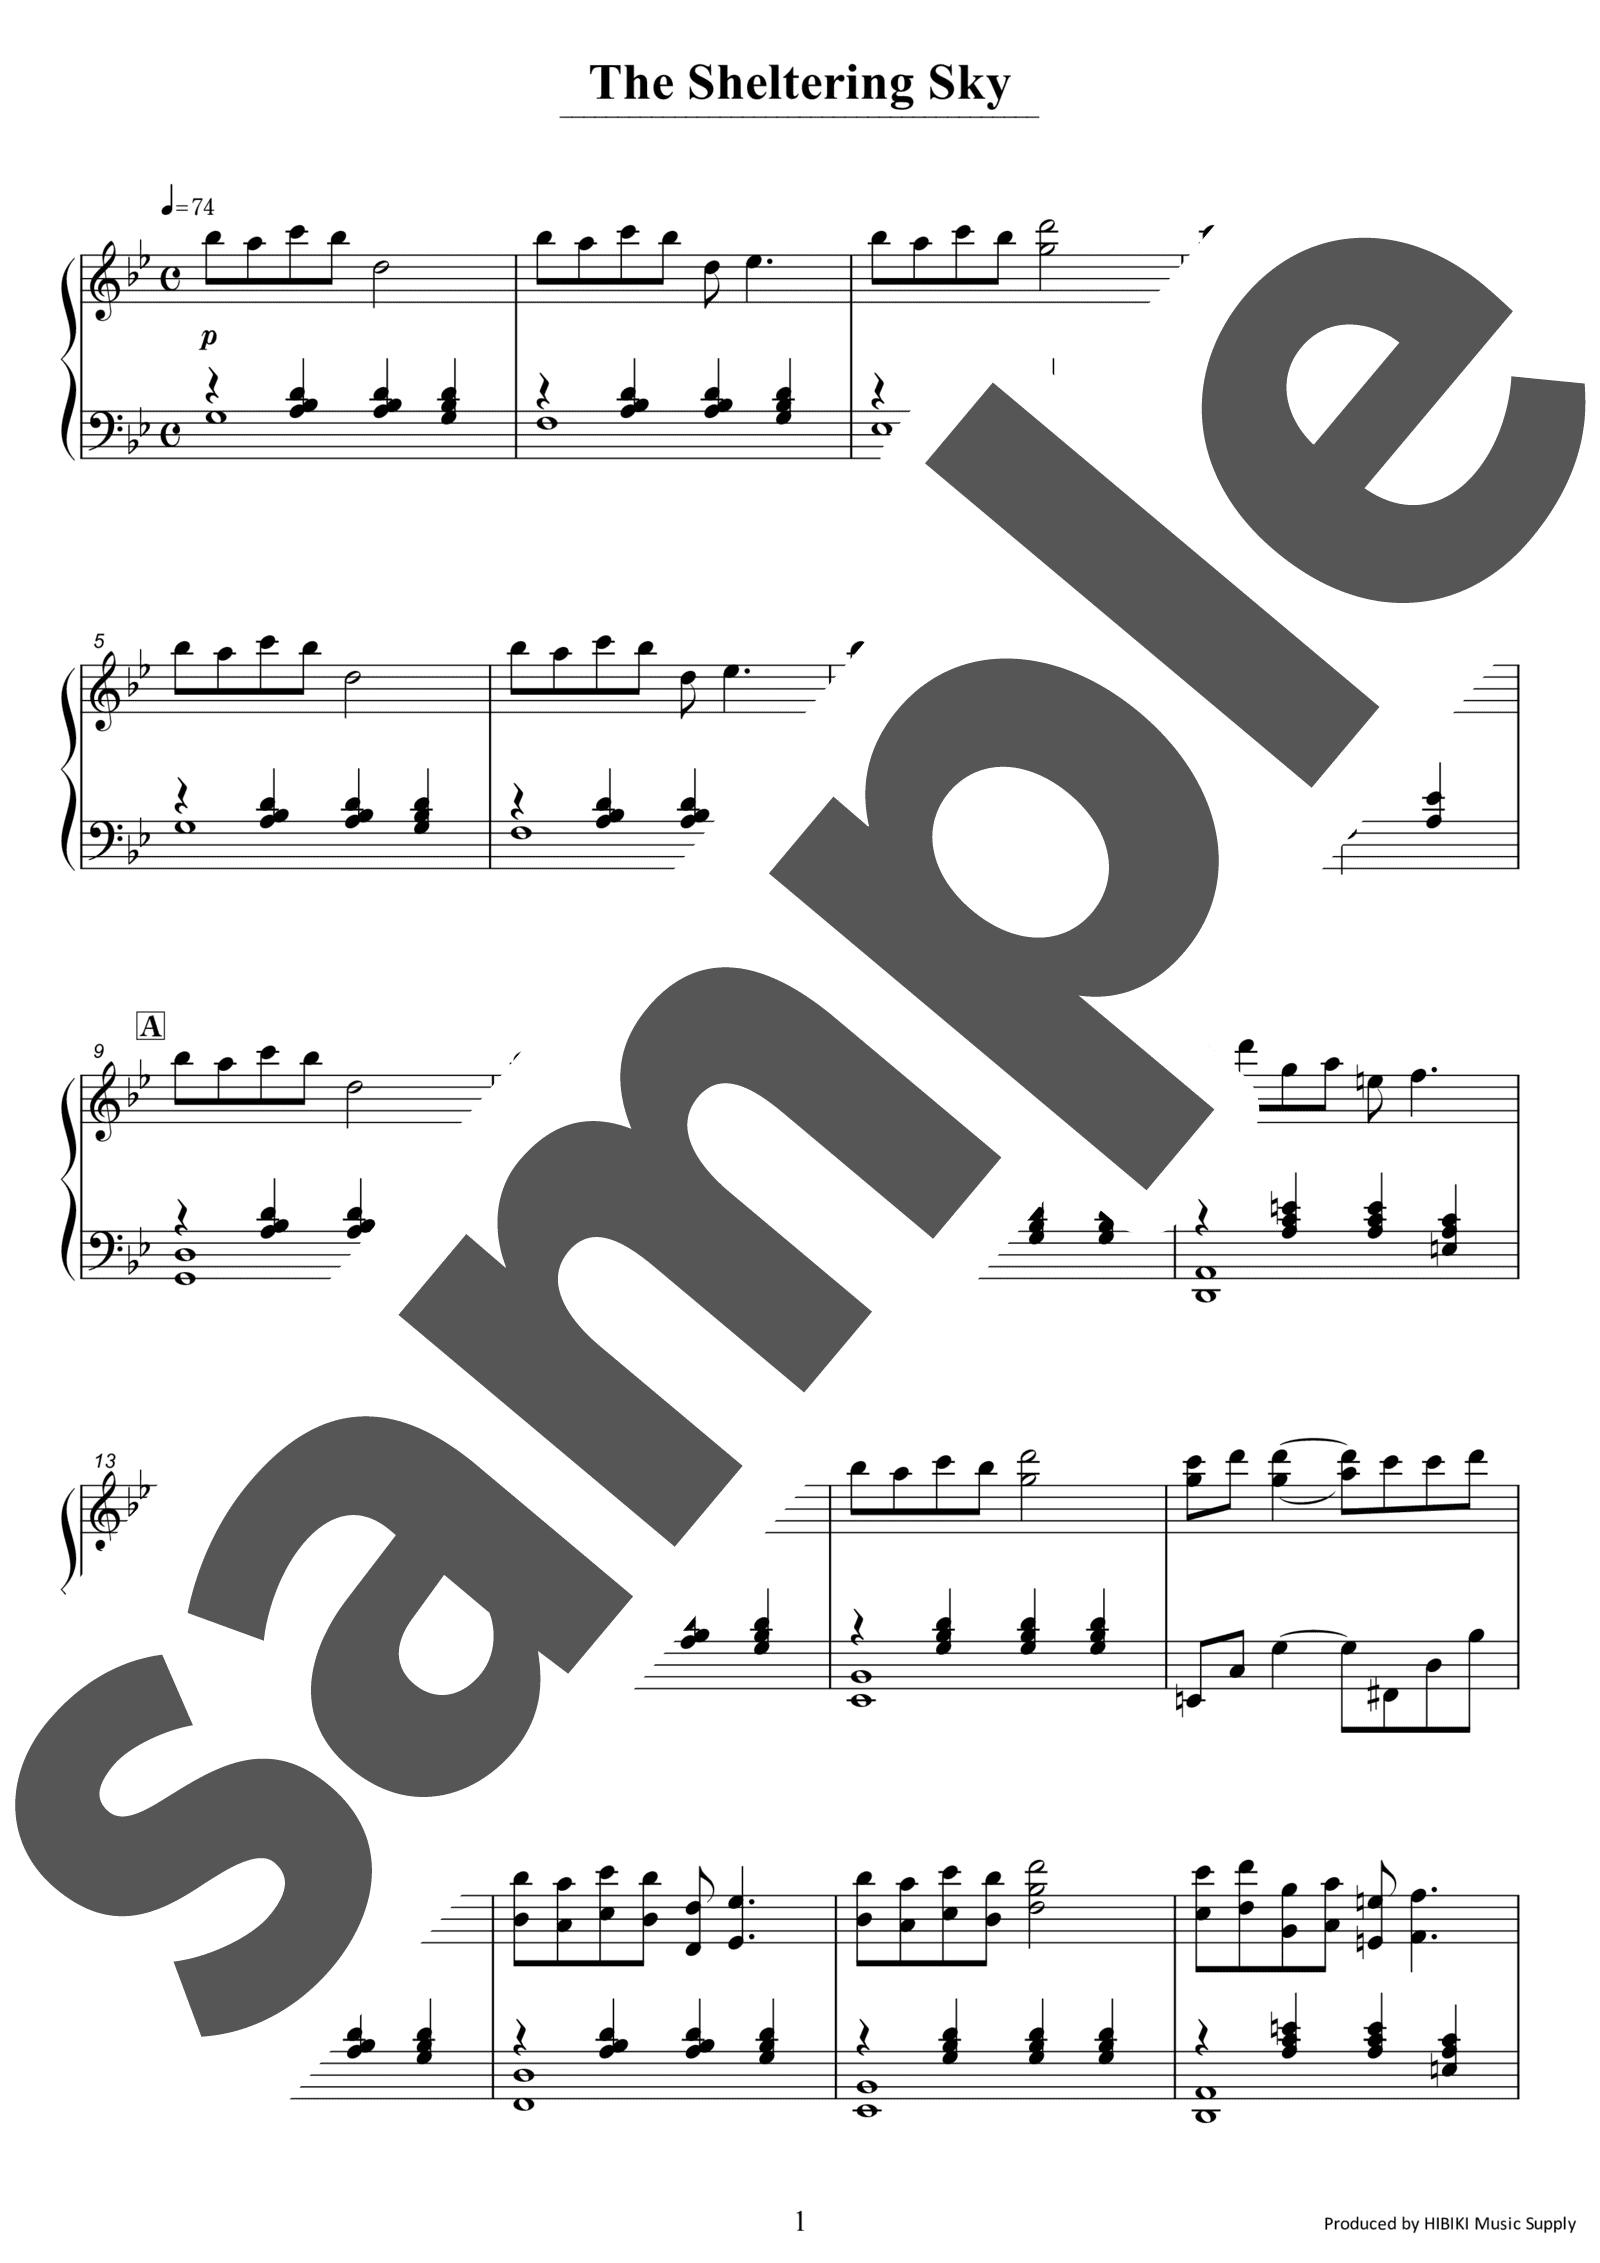 「The Sheltering Sky」のサンプル楽譜